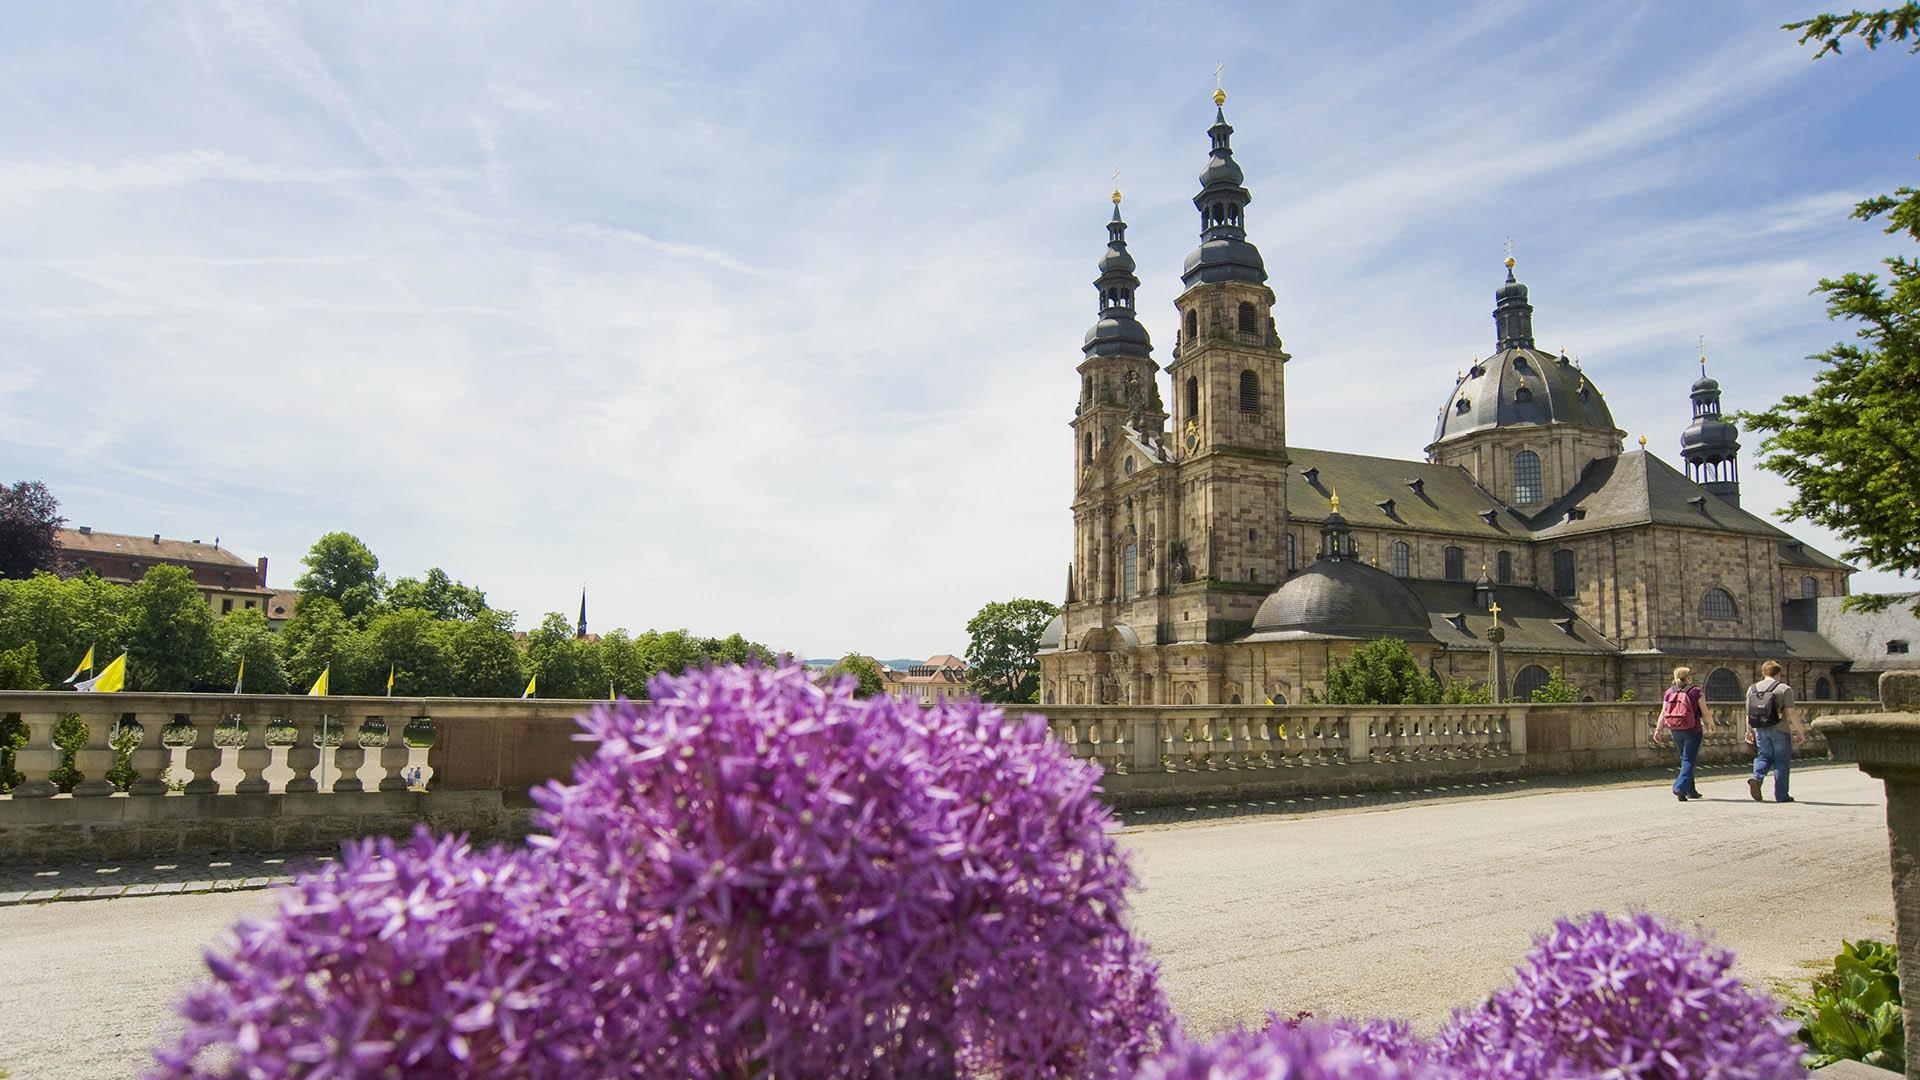 Ausflugsziele Fulda ca 40 km entfernt